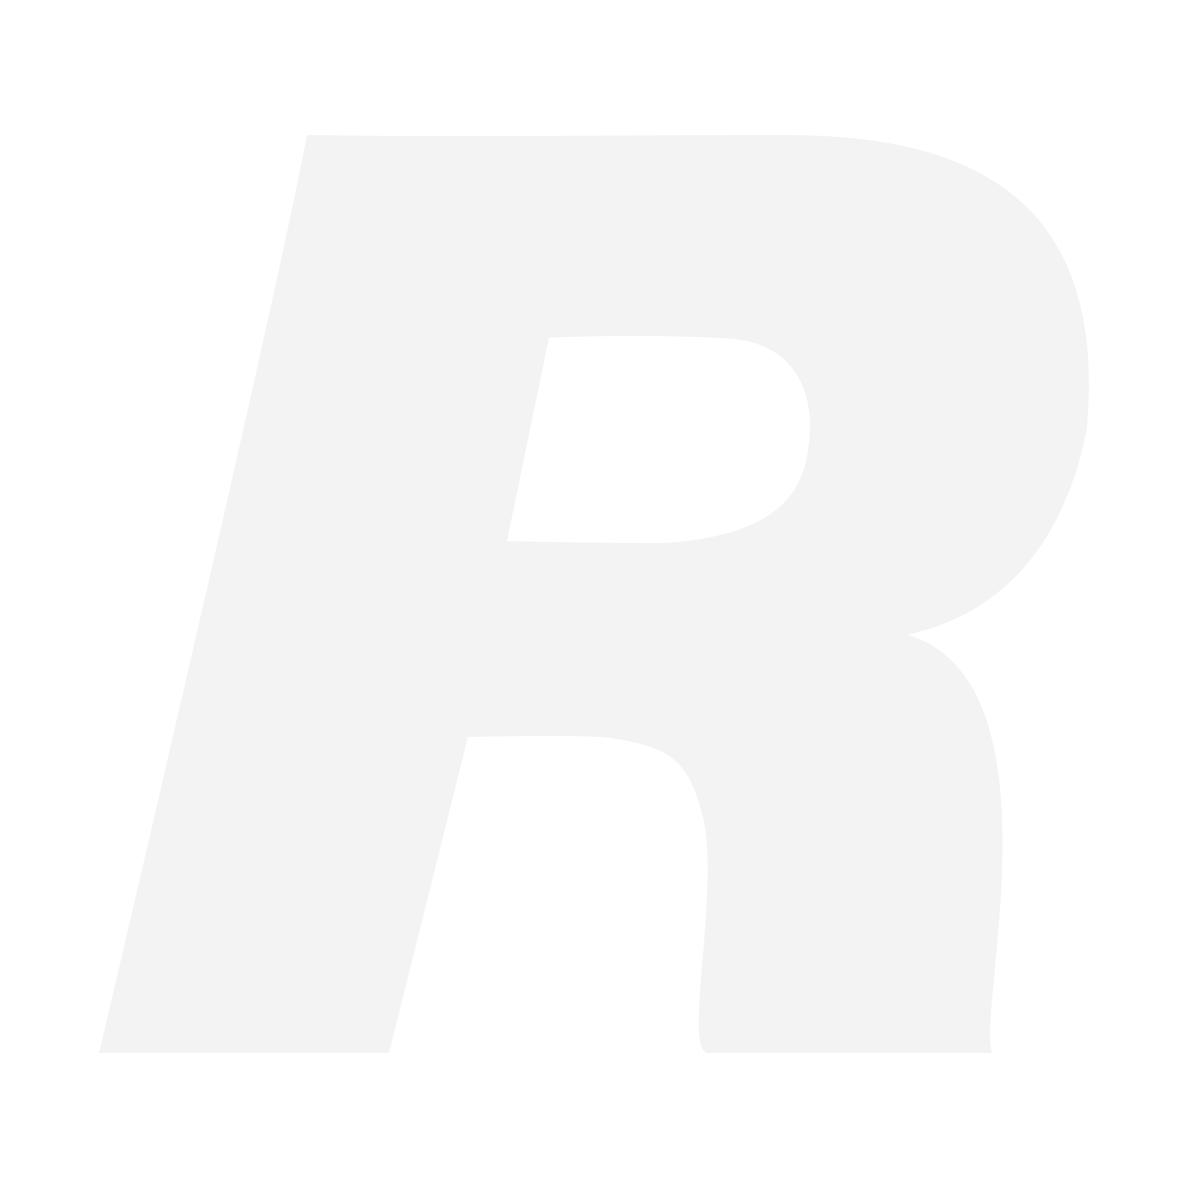 DJI Ronin M (New)